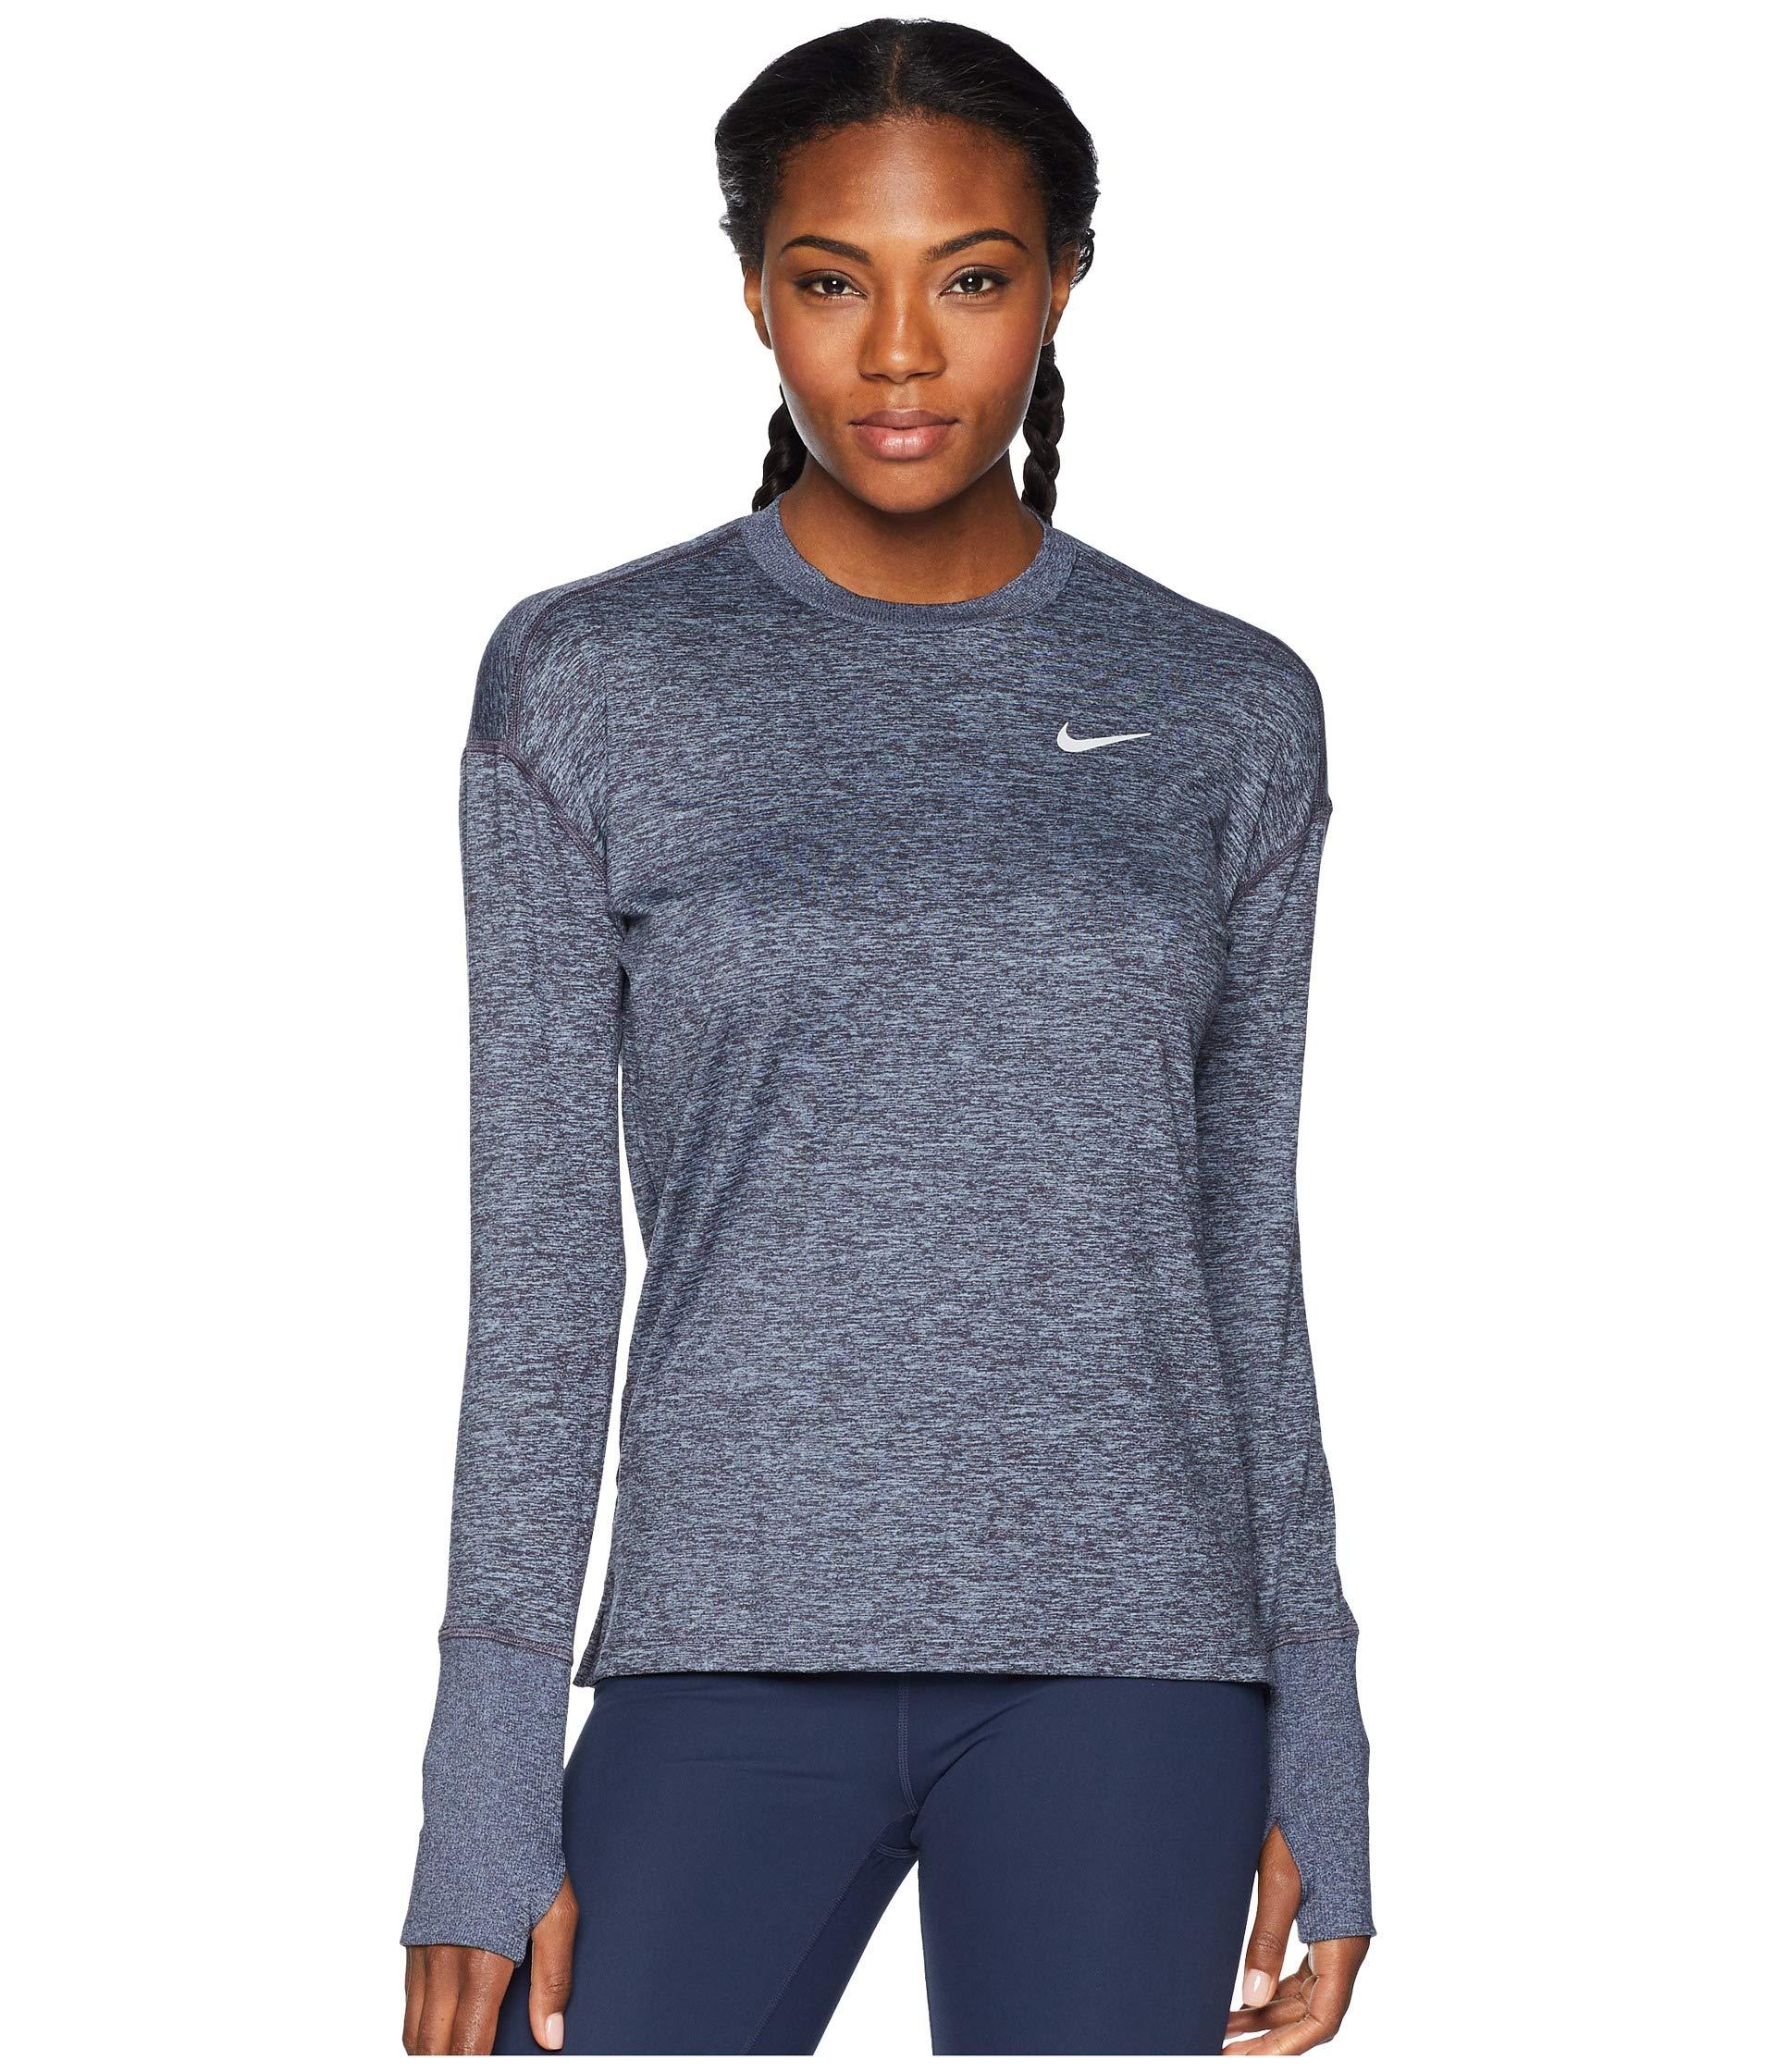 Nike Women's Element Crew Top Gridiron/Ashen Slate/Heather X-Small